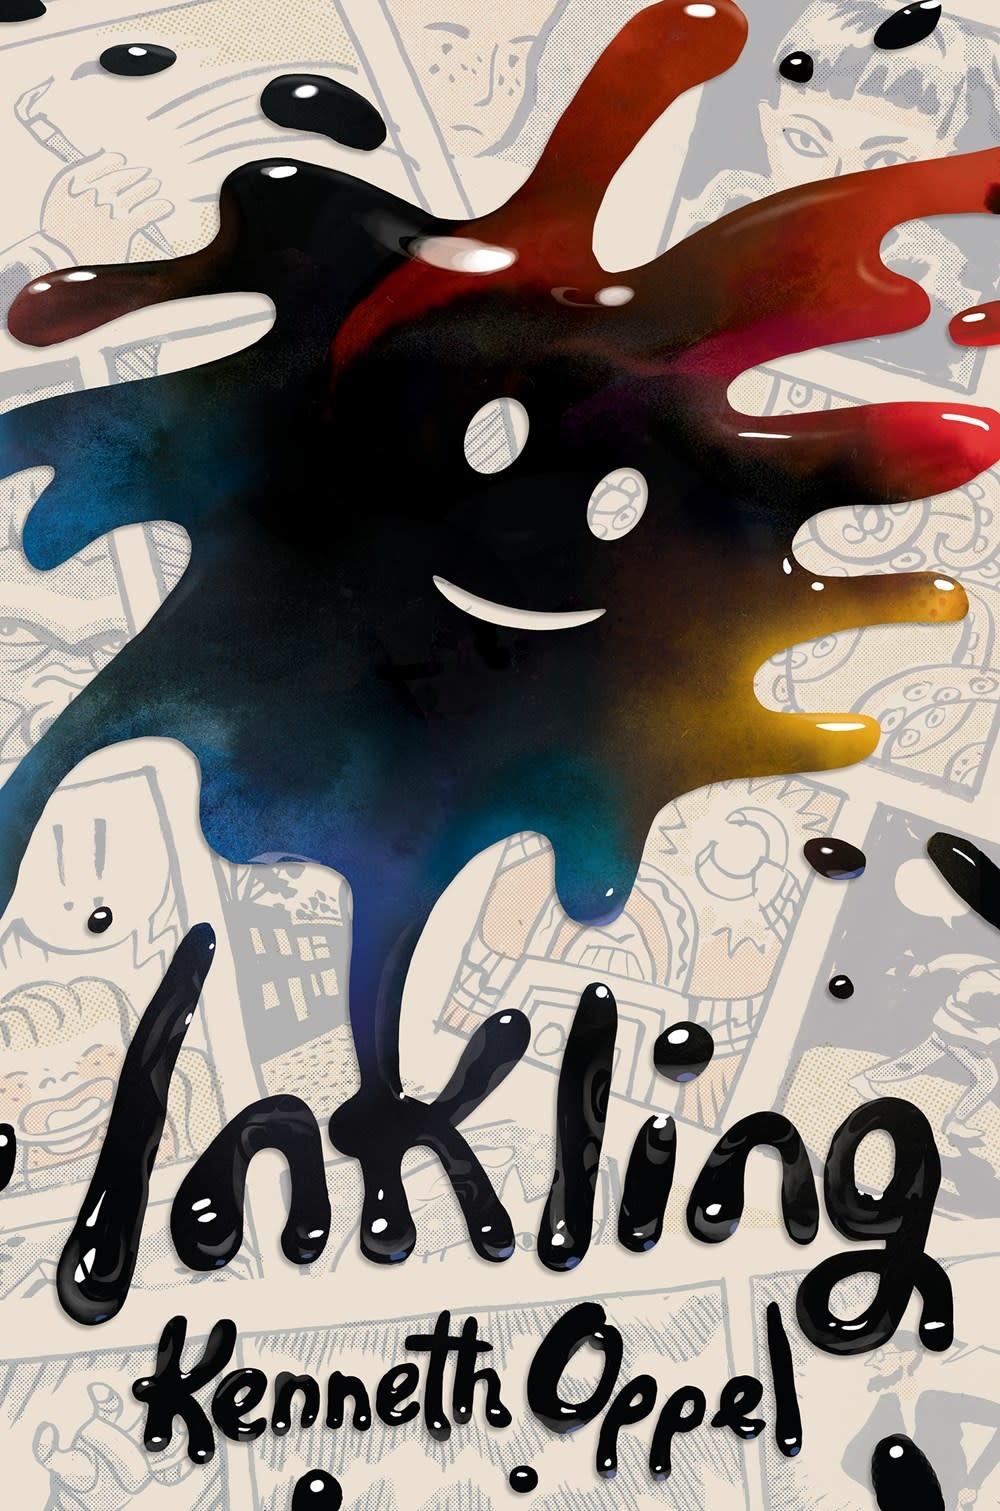 Yearling Inkling